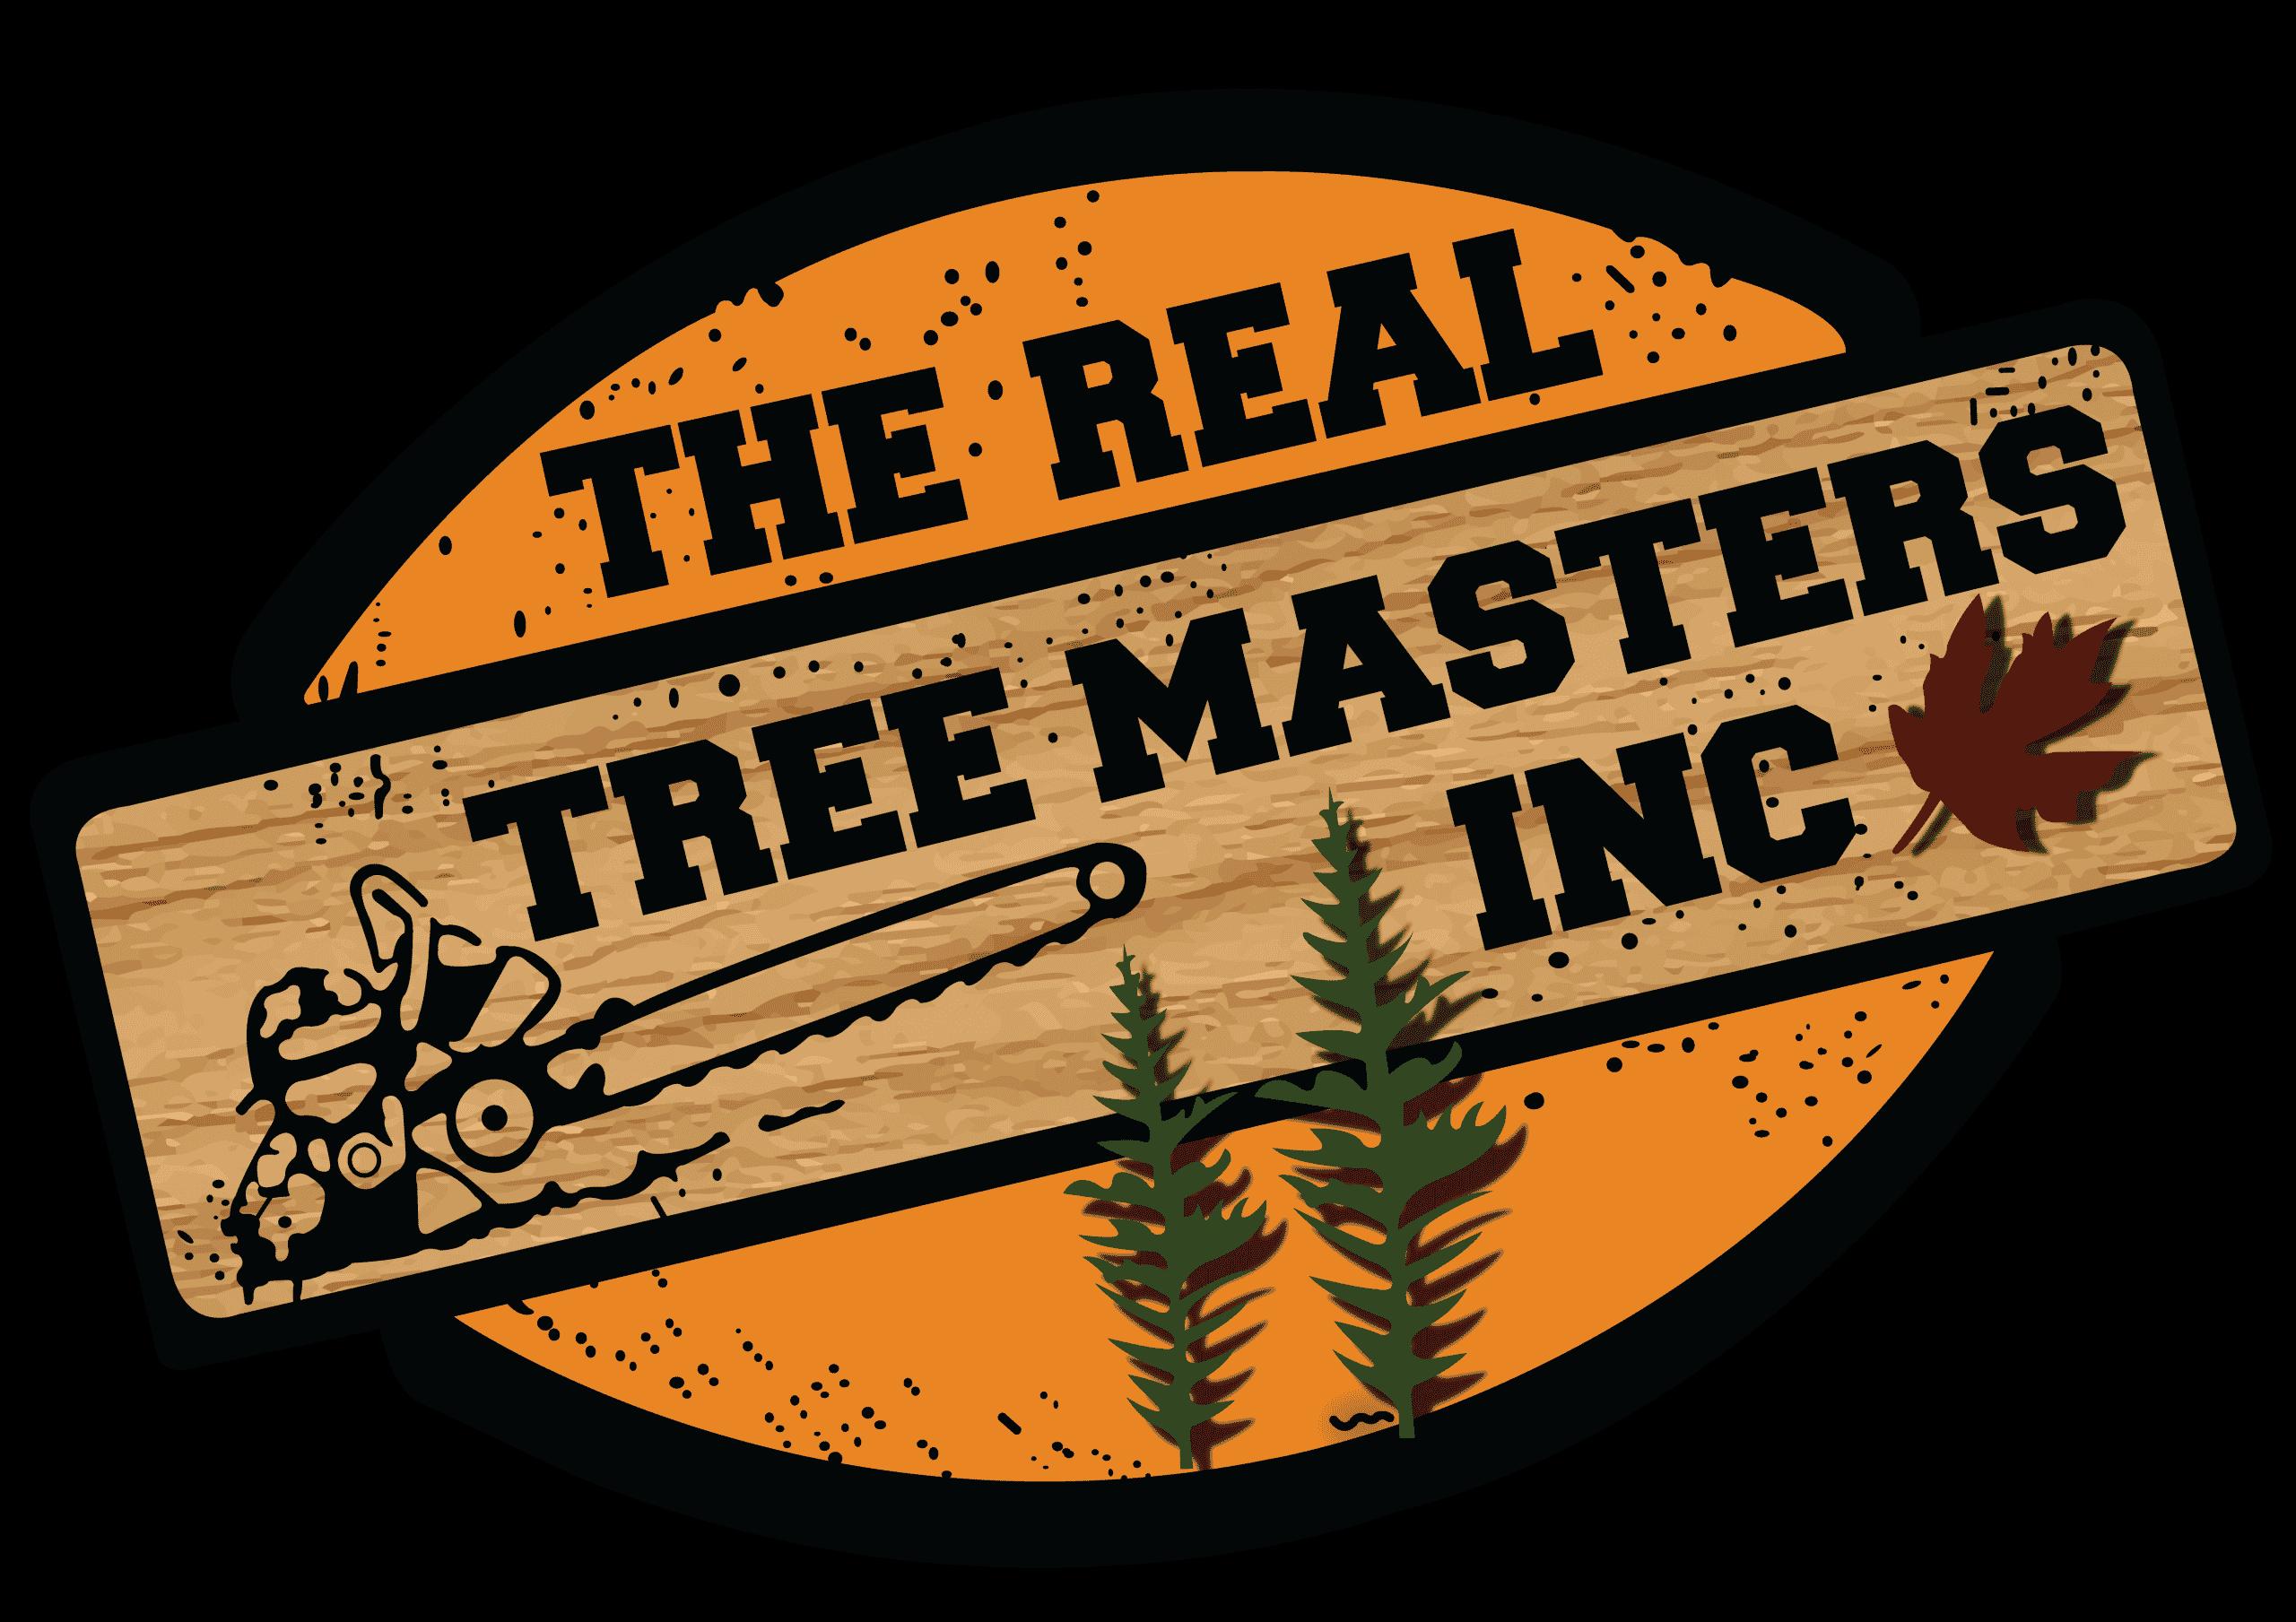 Tree-Expert-Tree-Specialist